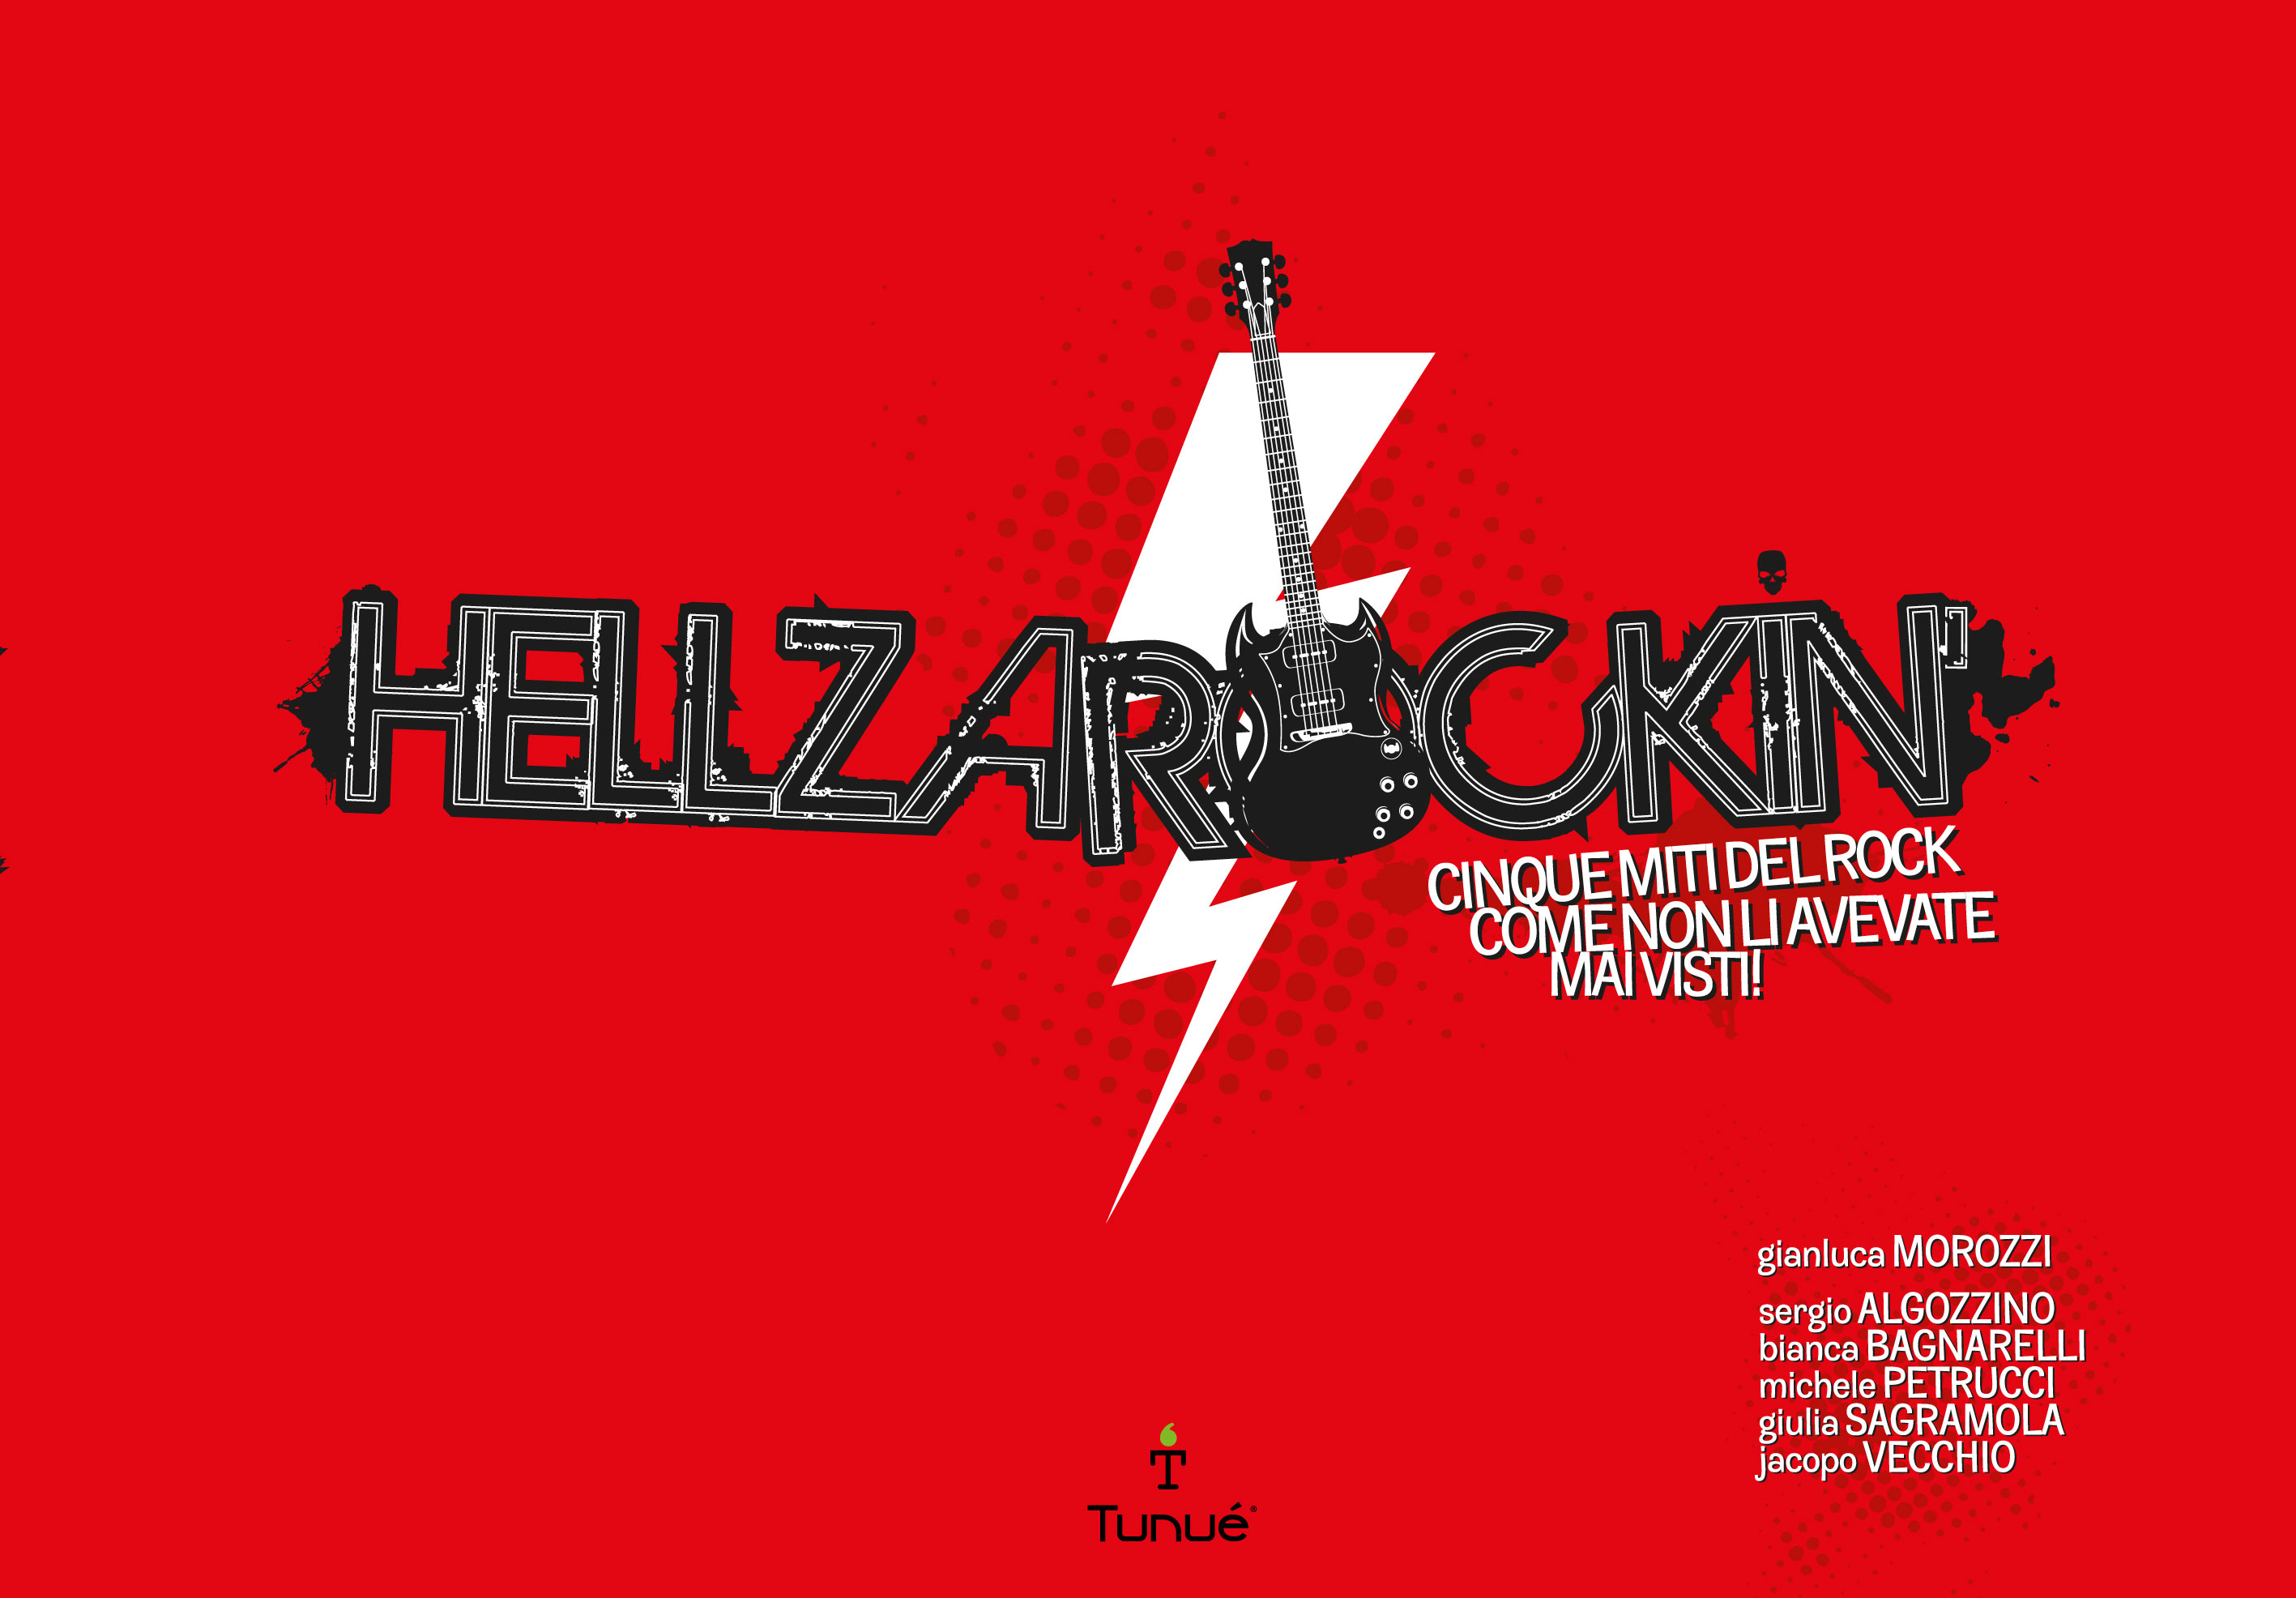 Hellzarockin'